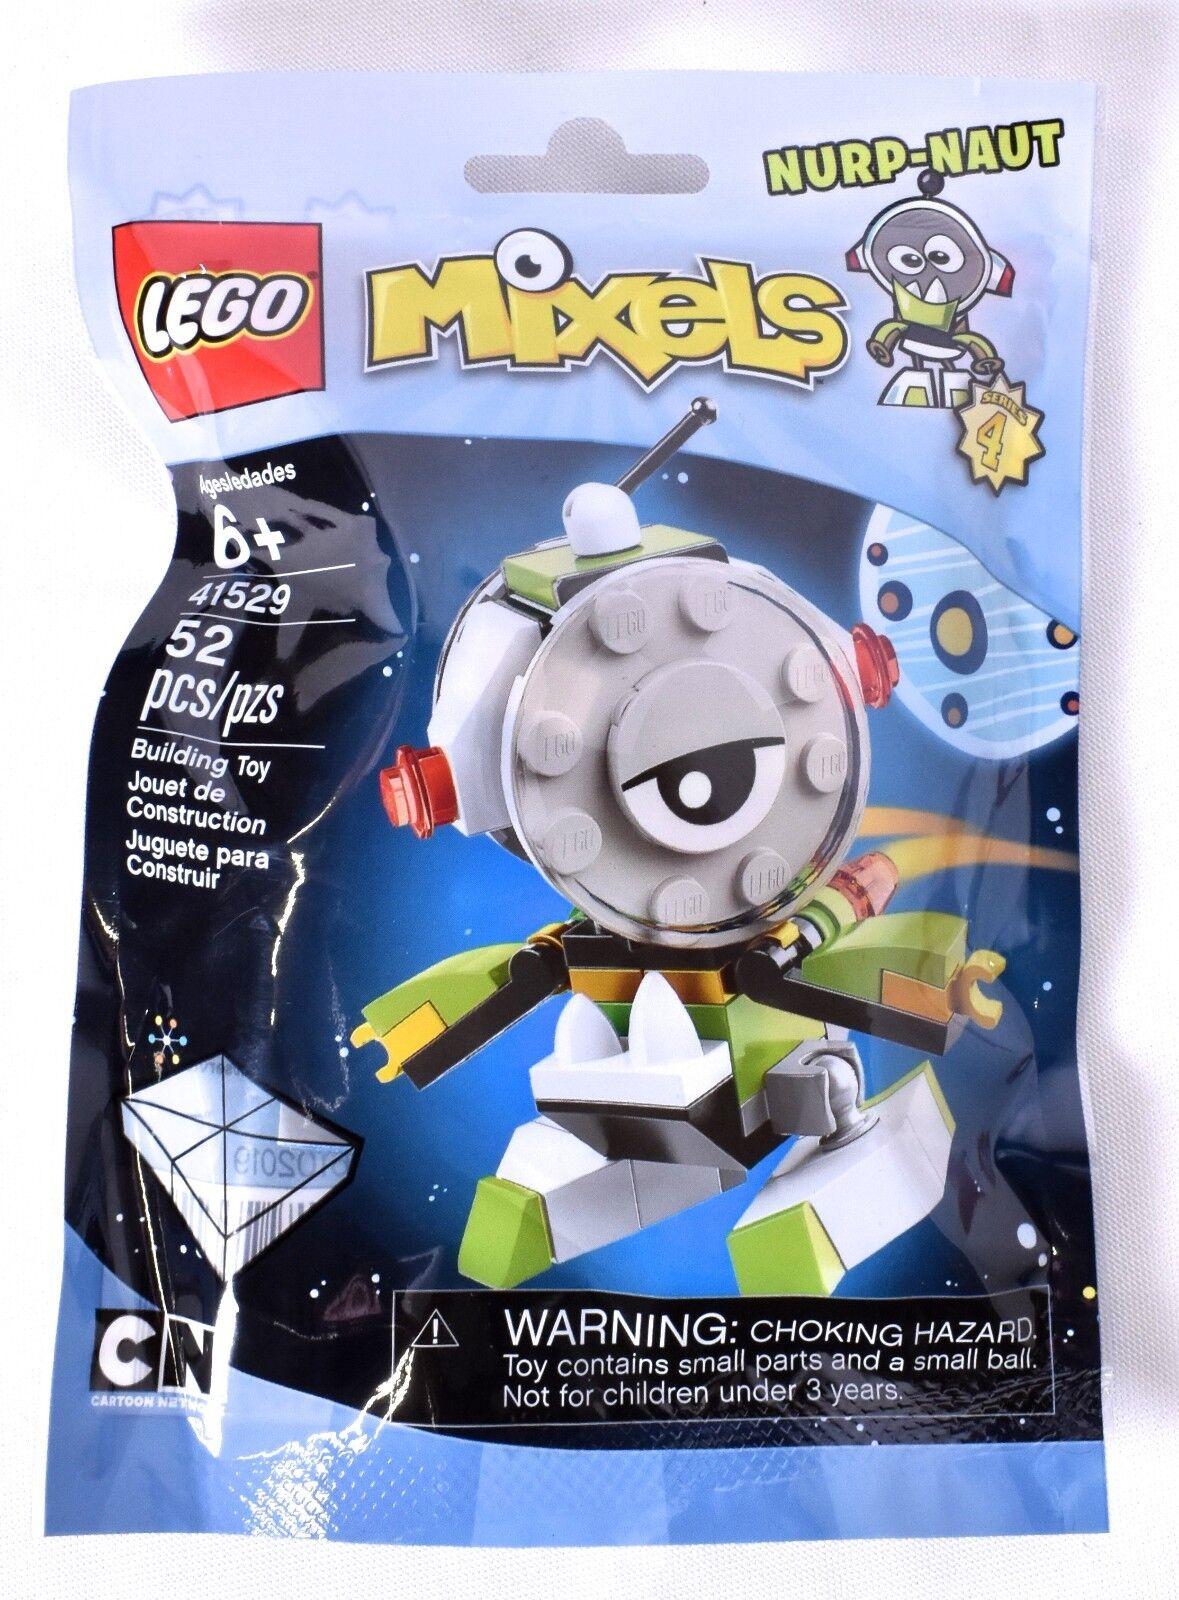 Lego Set Packs New Niksputnurpnautrokit Mixels 3 Of 4four Series wOZlTPukXi